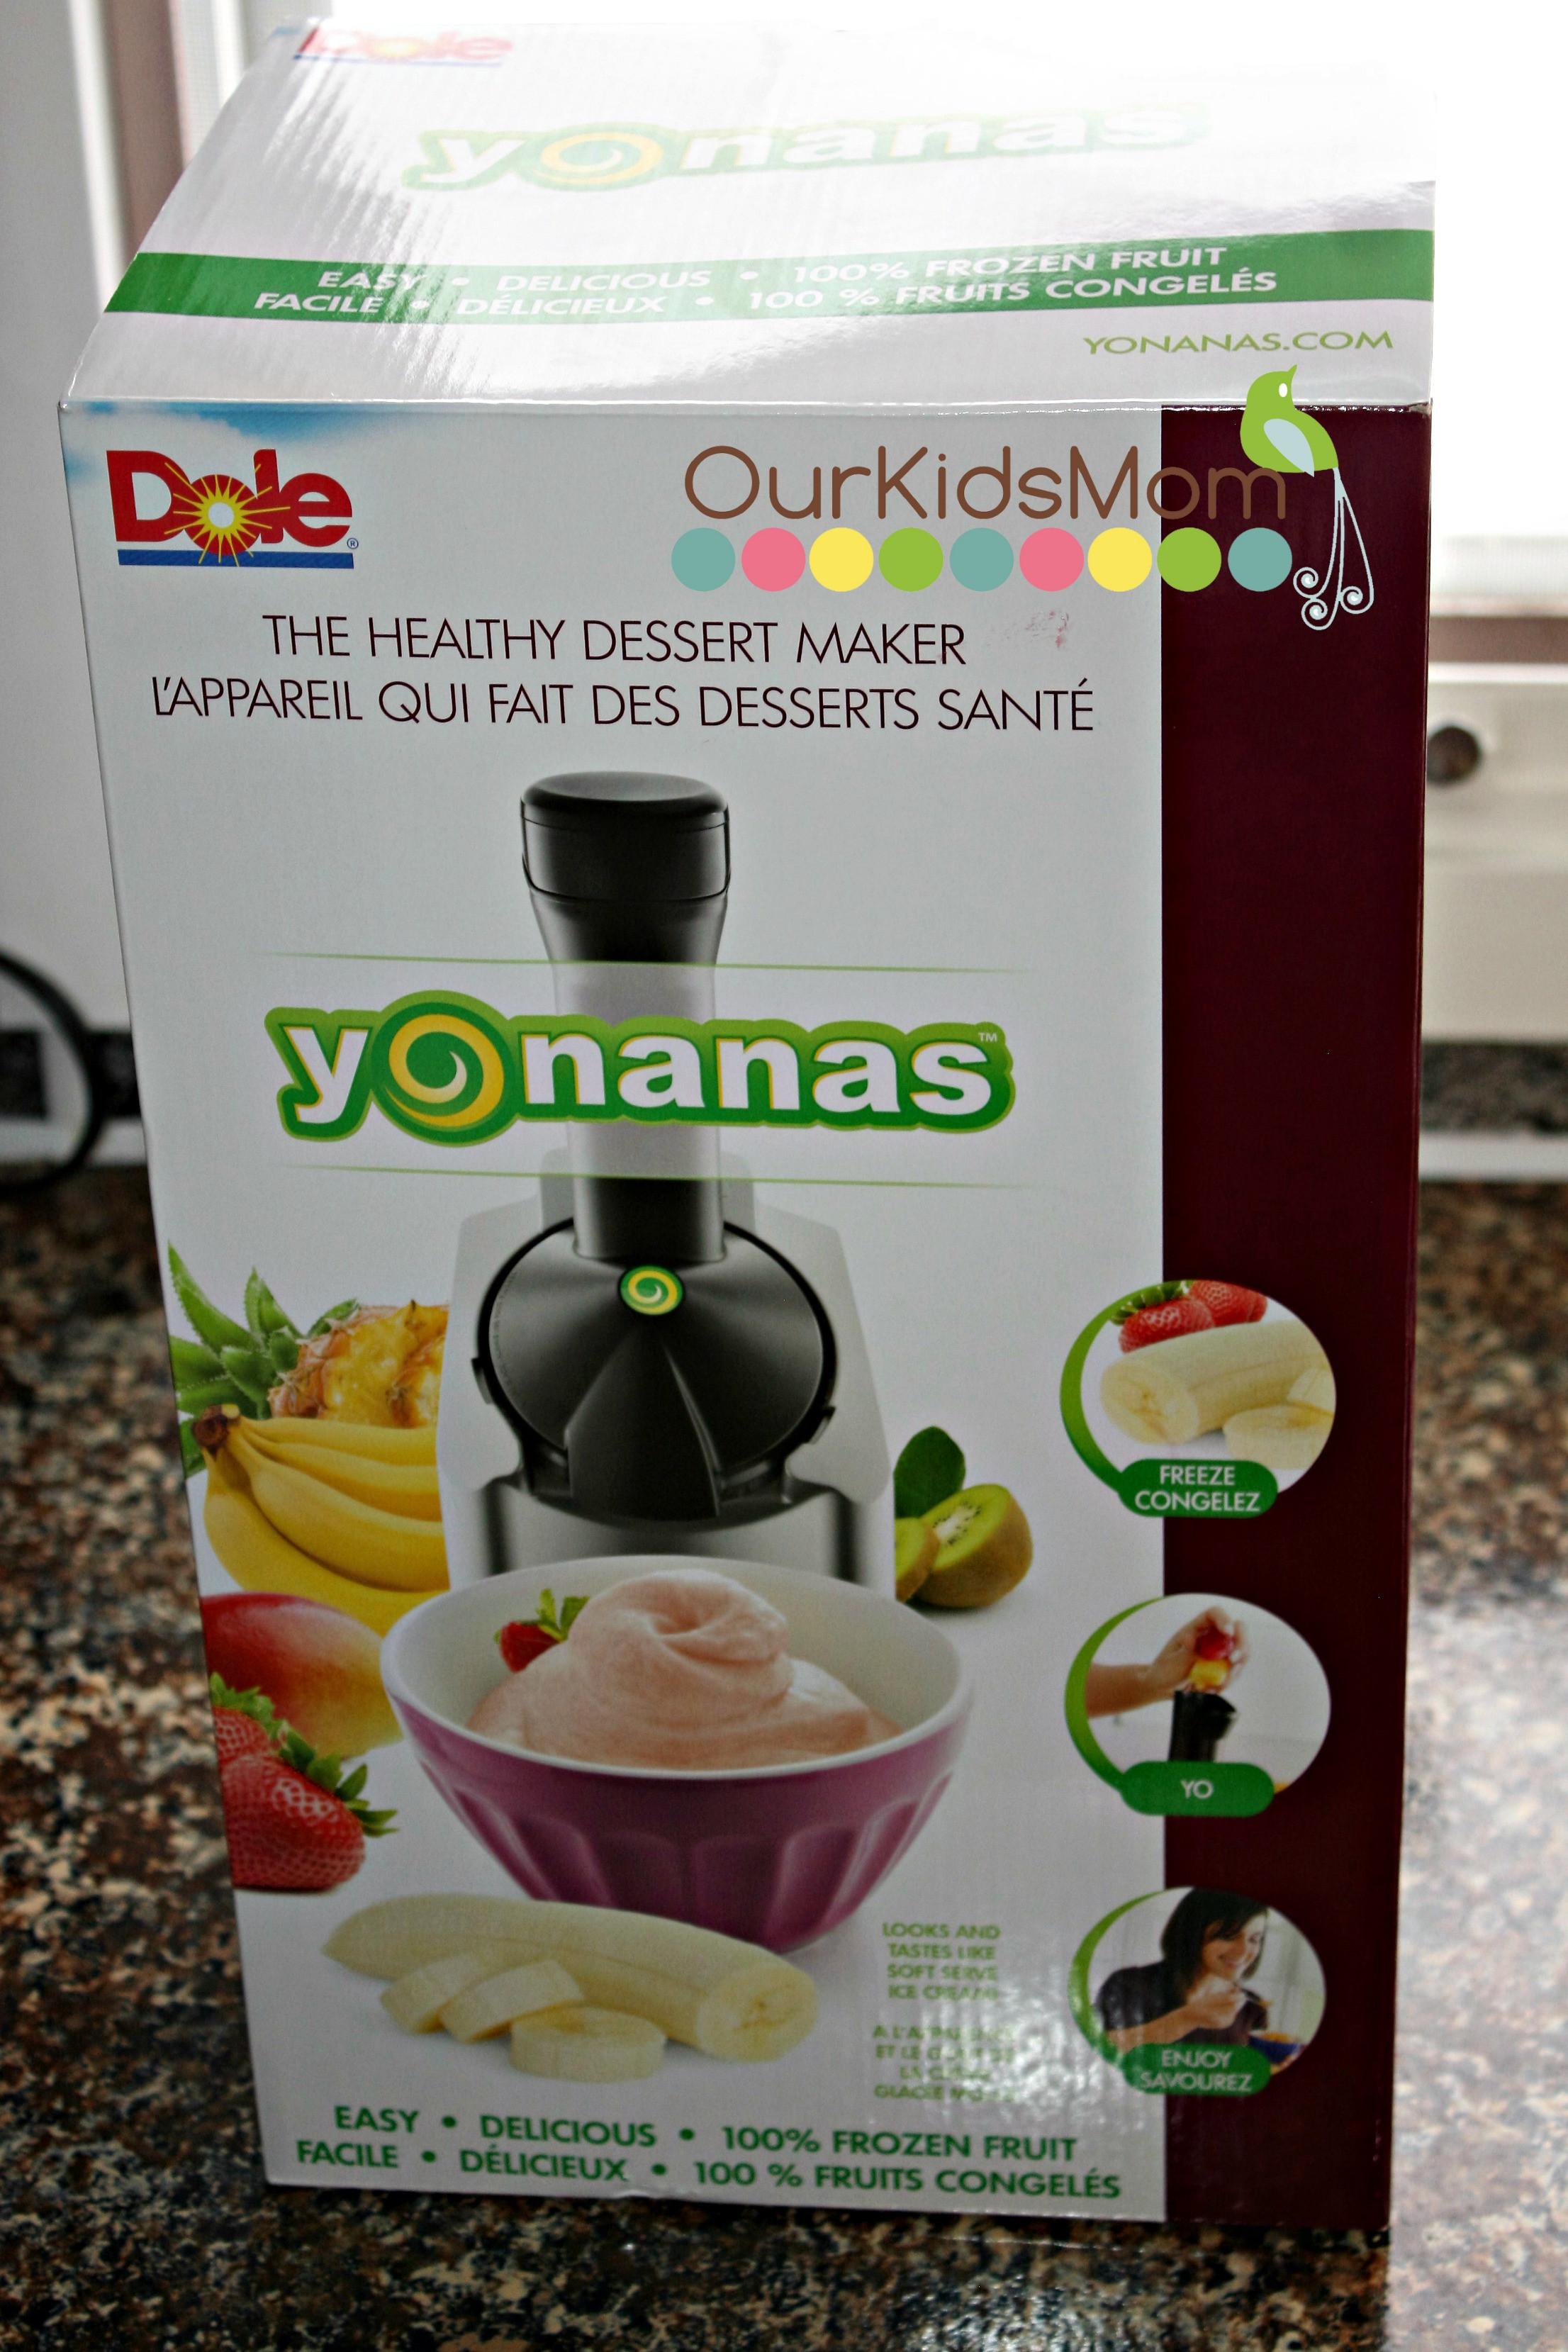 Yonanas Healthy Dessert Maker  Yonanas Healthy Dessert Maker OurKidsMom